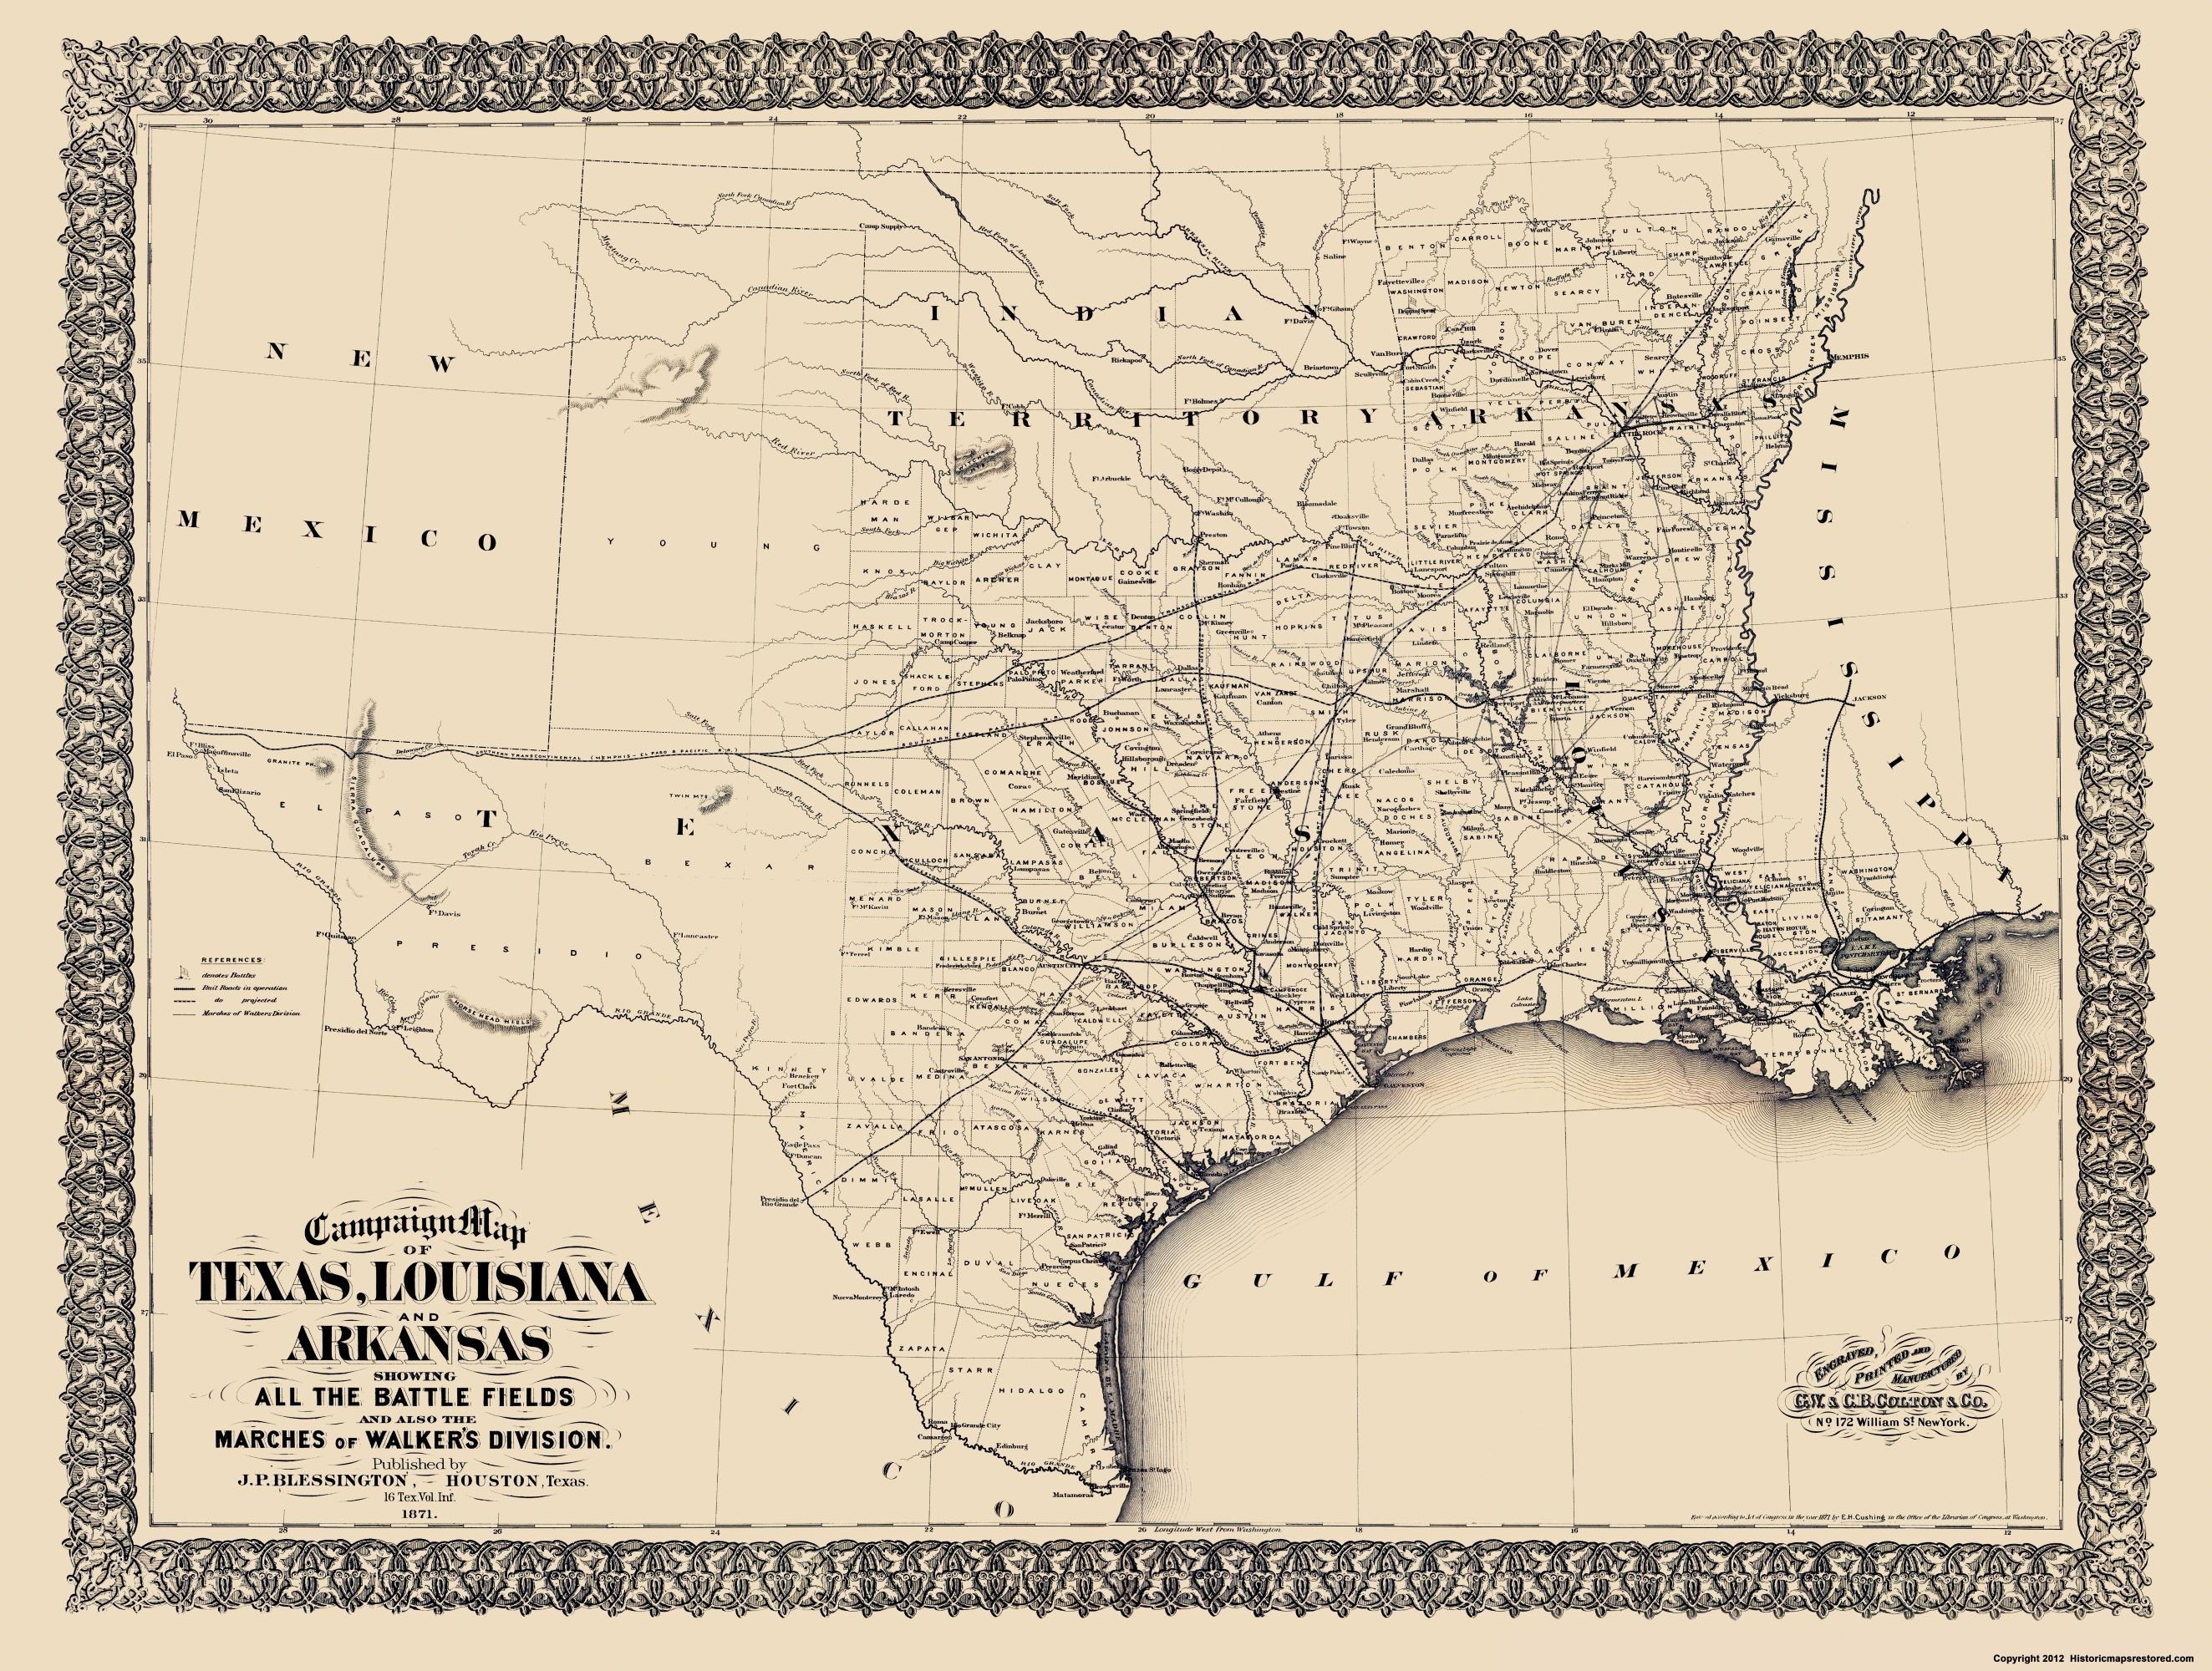 Civil War Map - Texas, Louisiana, & Arkansas 1871 - Texas Arkansas Map